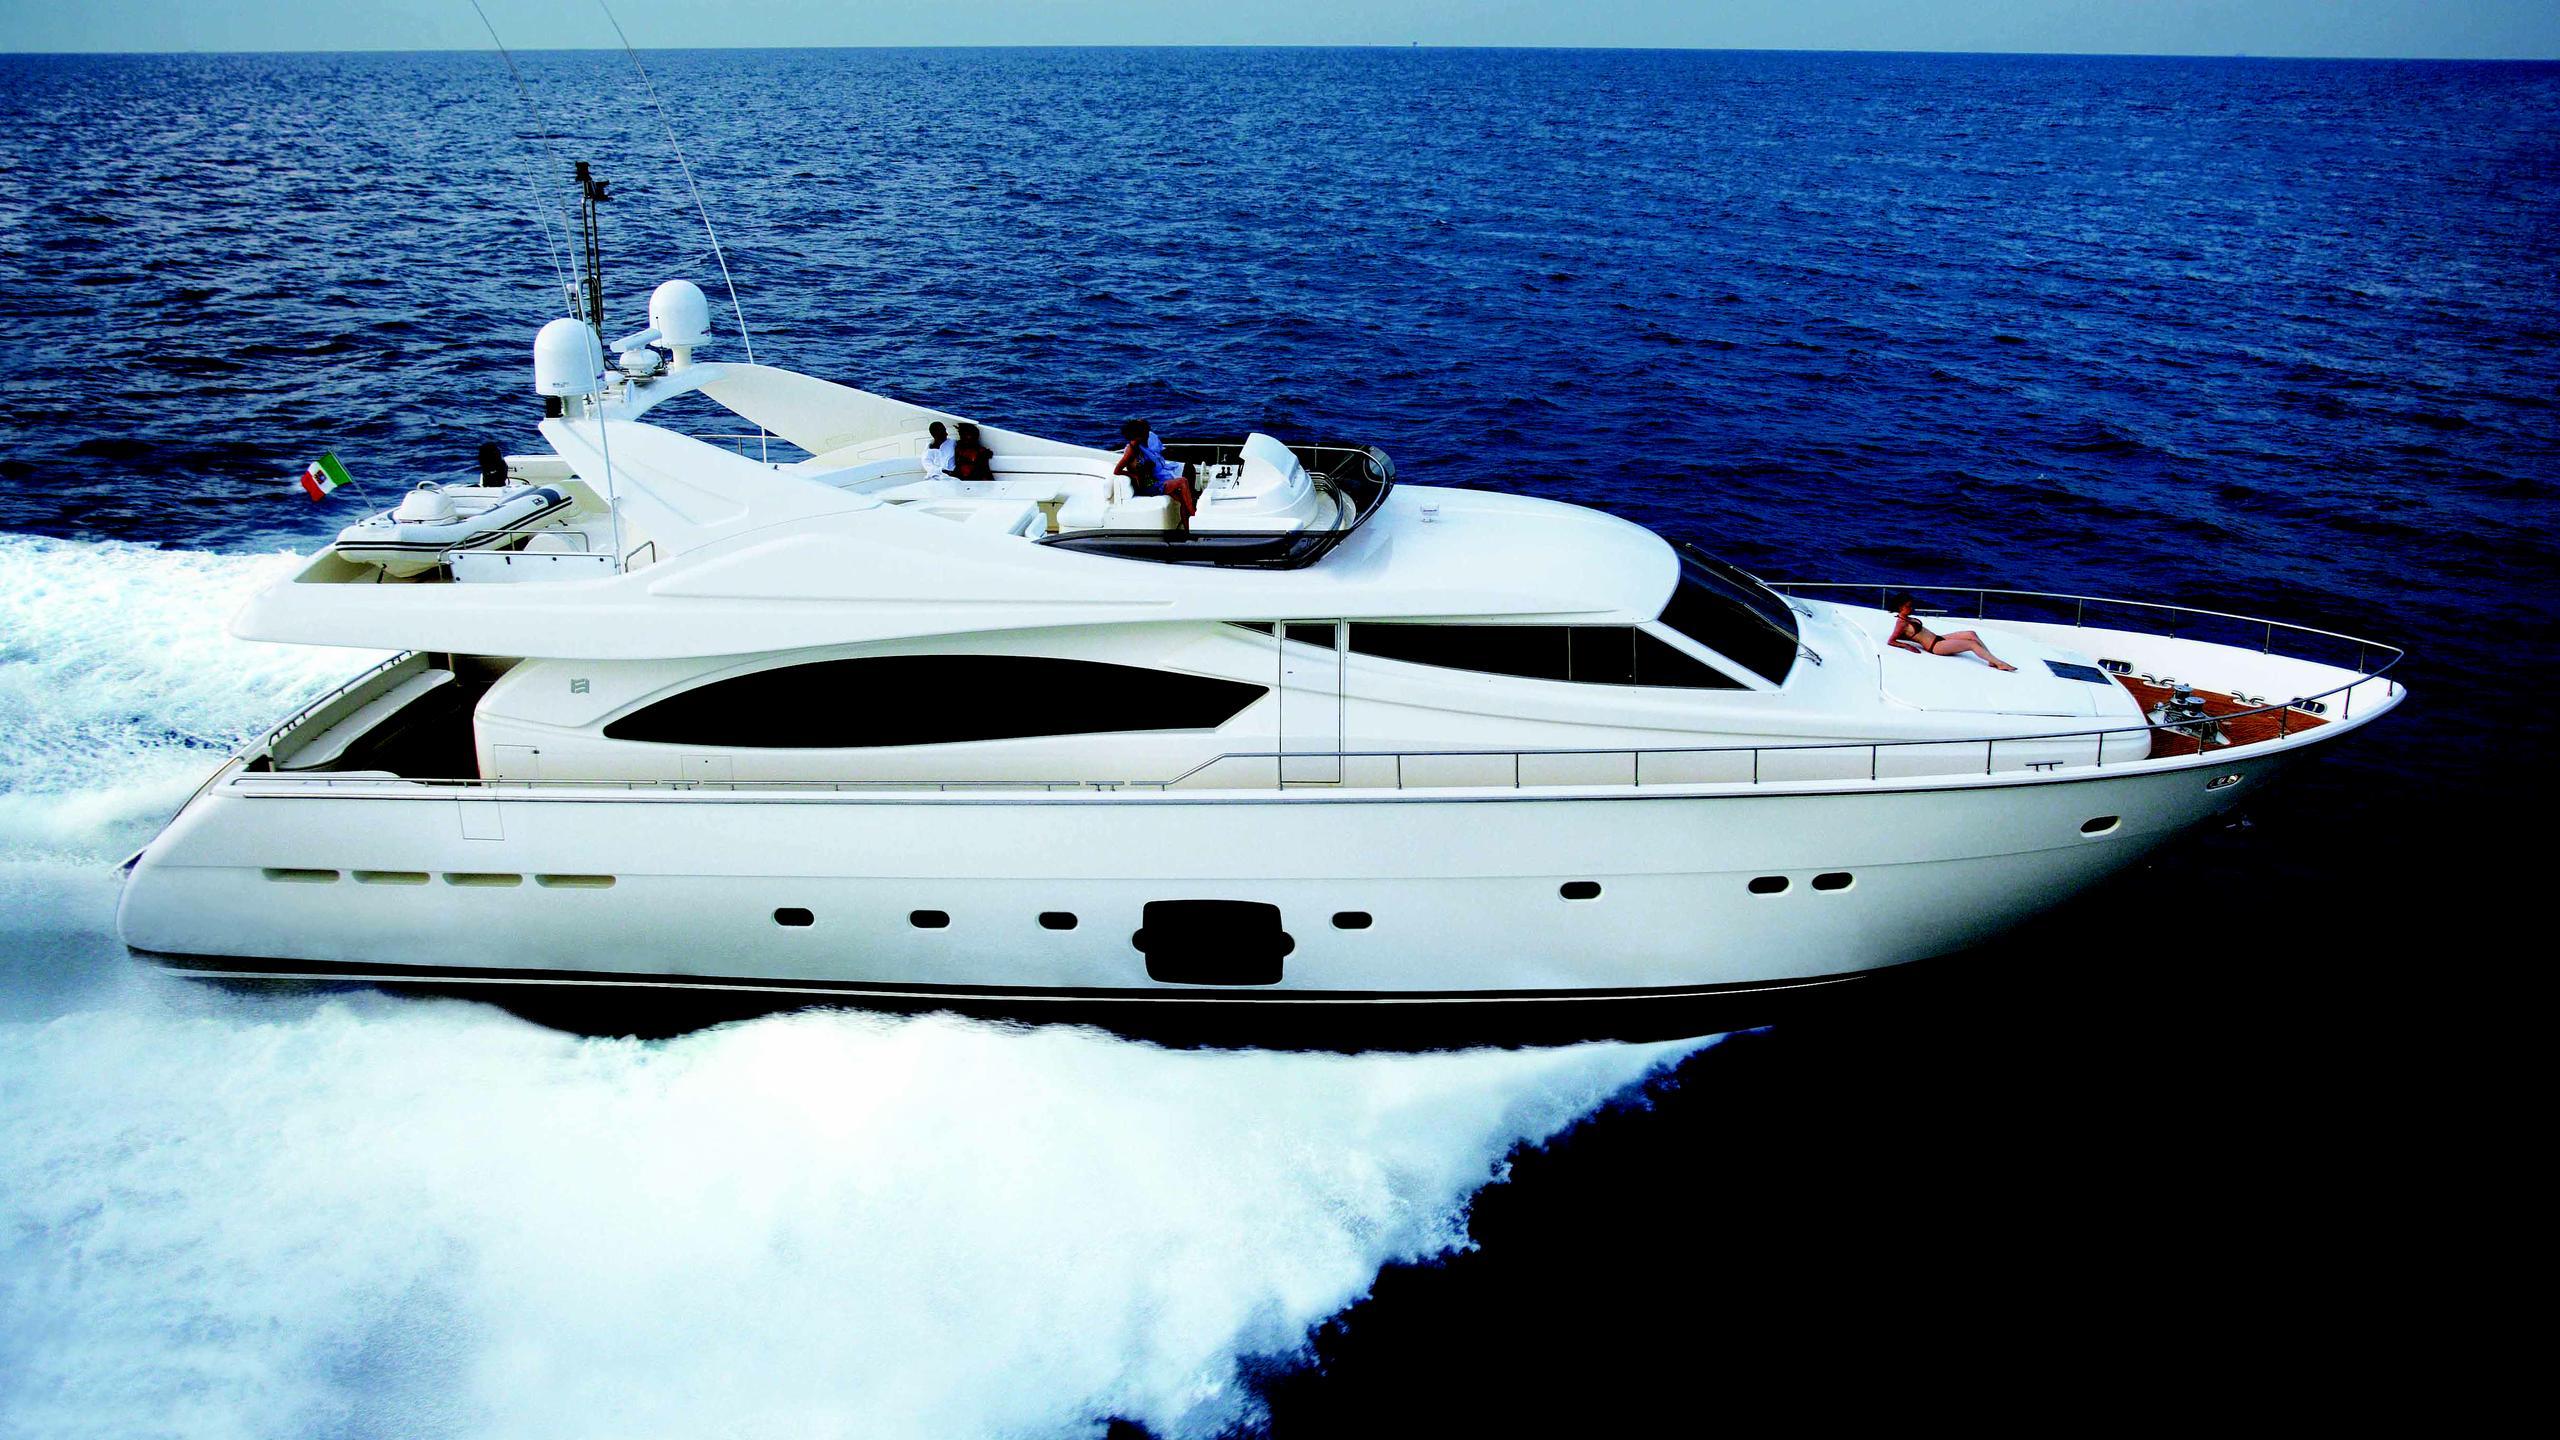 ferretti-880-07-motor-yacht-ferretti-880-2004-27m-cruising